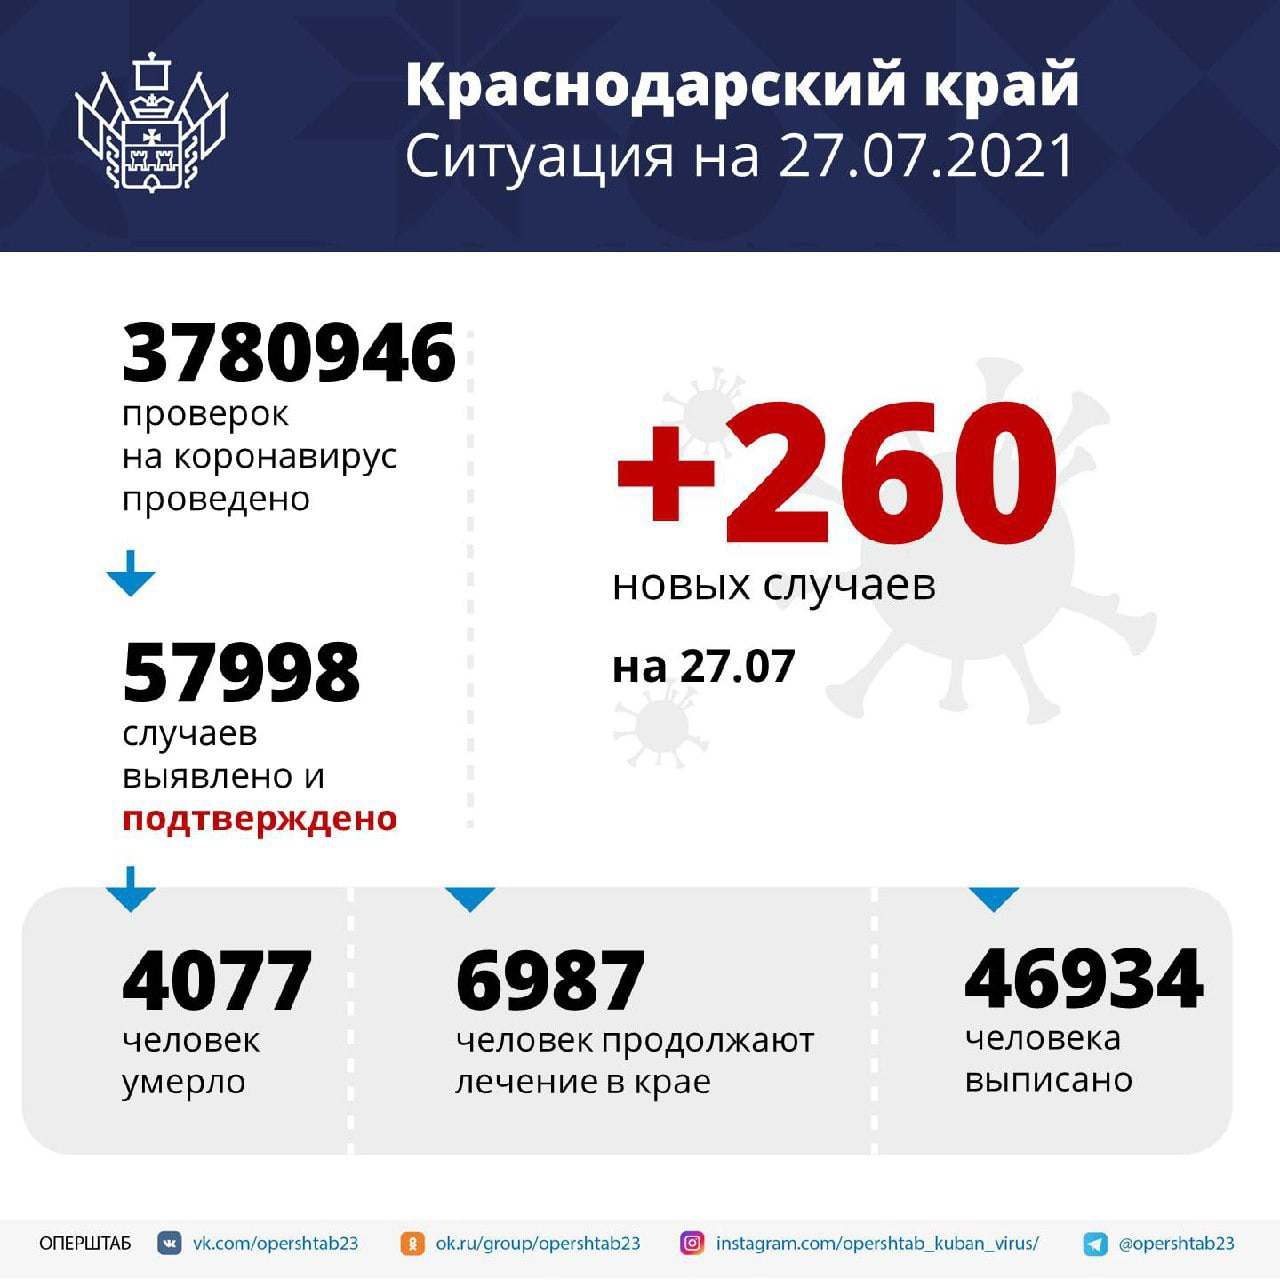 На Кубани за сутки зарегистрировали 260 заболевших коронавирусной...